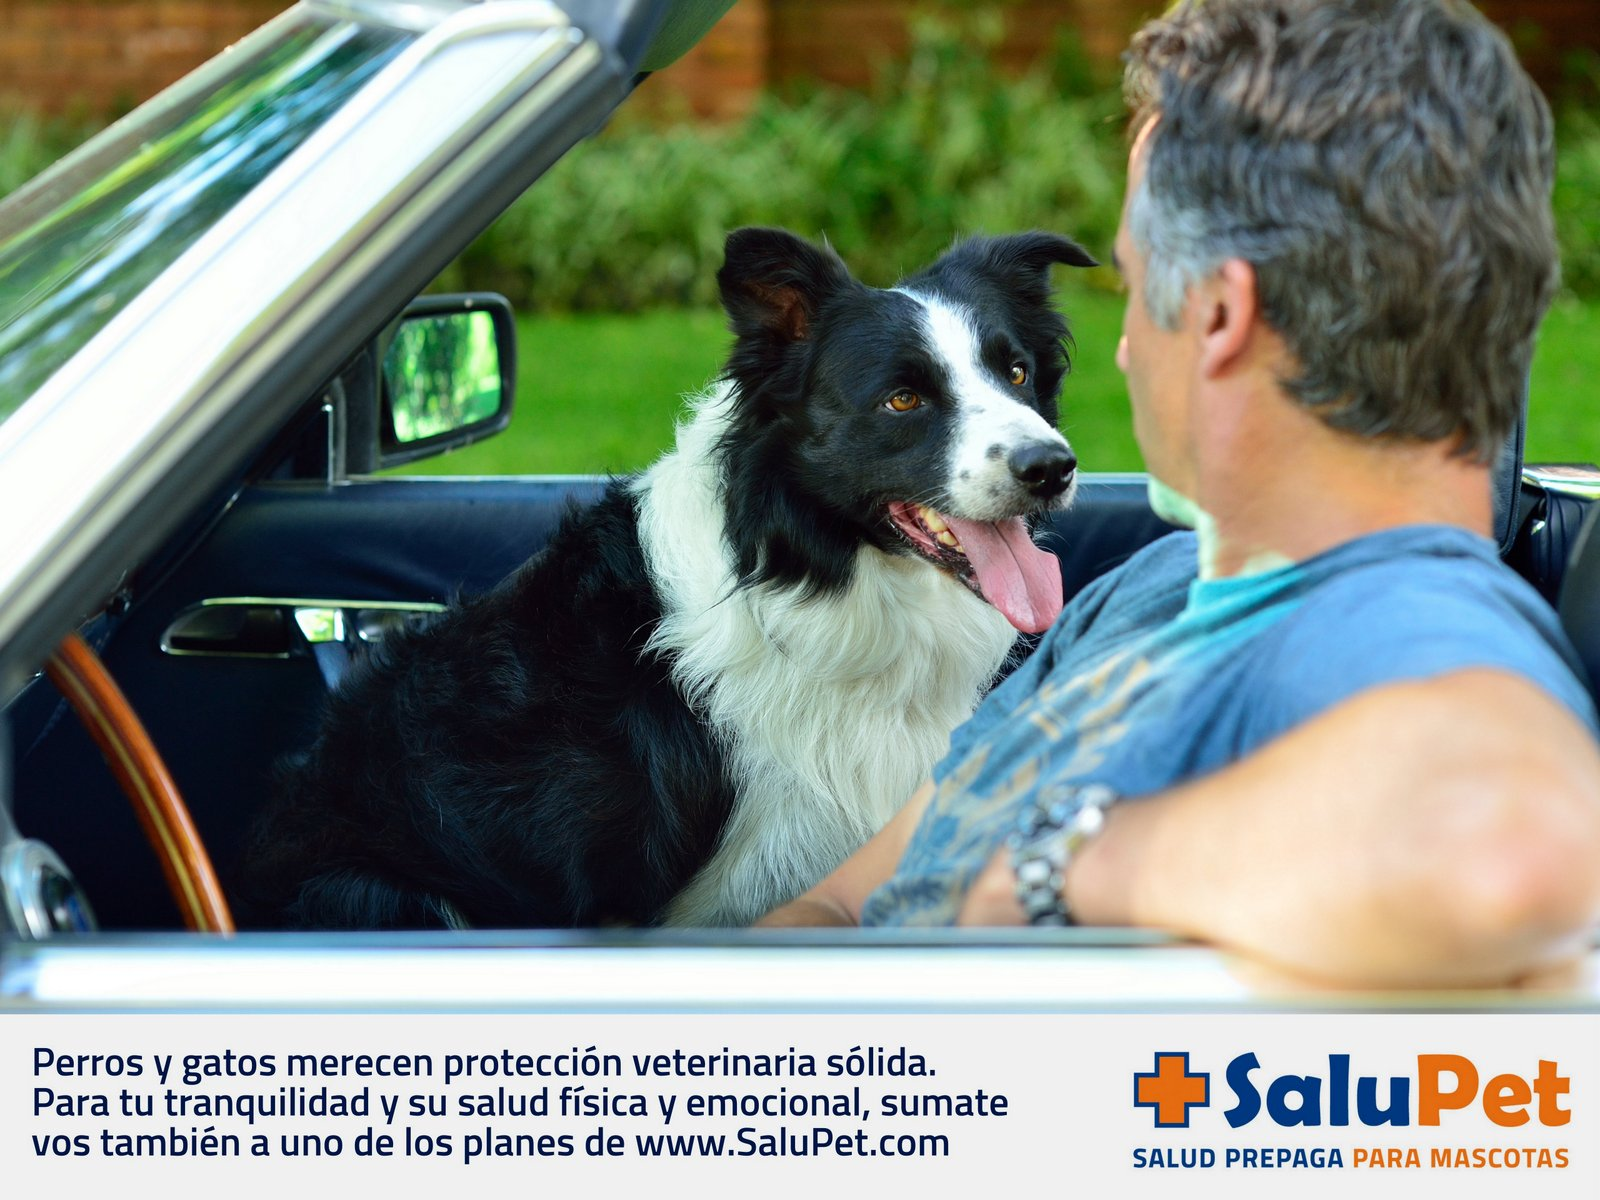 SaluPet 01 - Pablo Cersosimo 20140812 LR.jpg